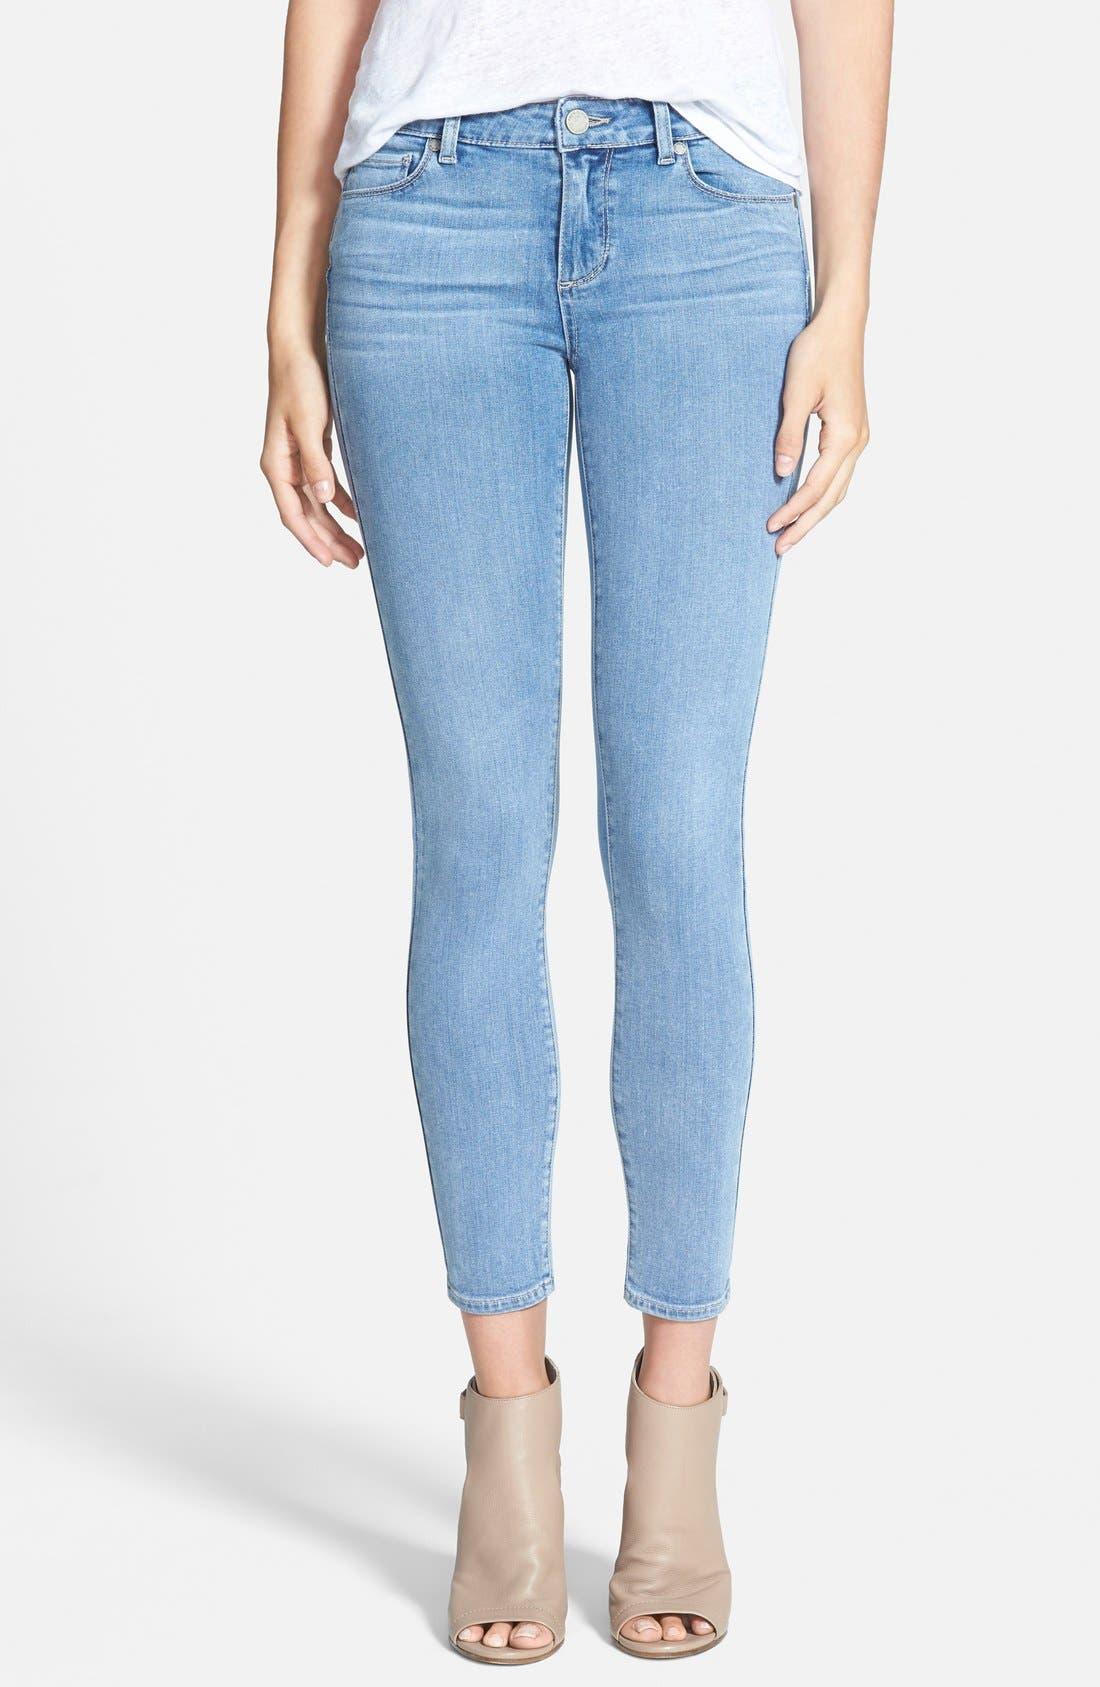 Main Image - Paige Denim 'Transcend - Verdugo' Ankle Ultra Skinny Jeans (Joelle)